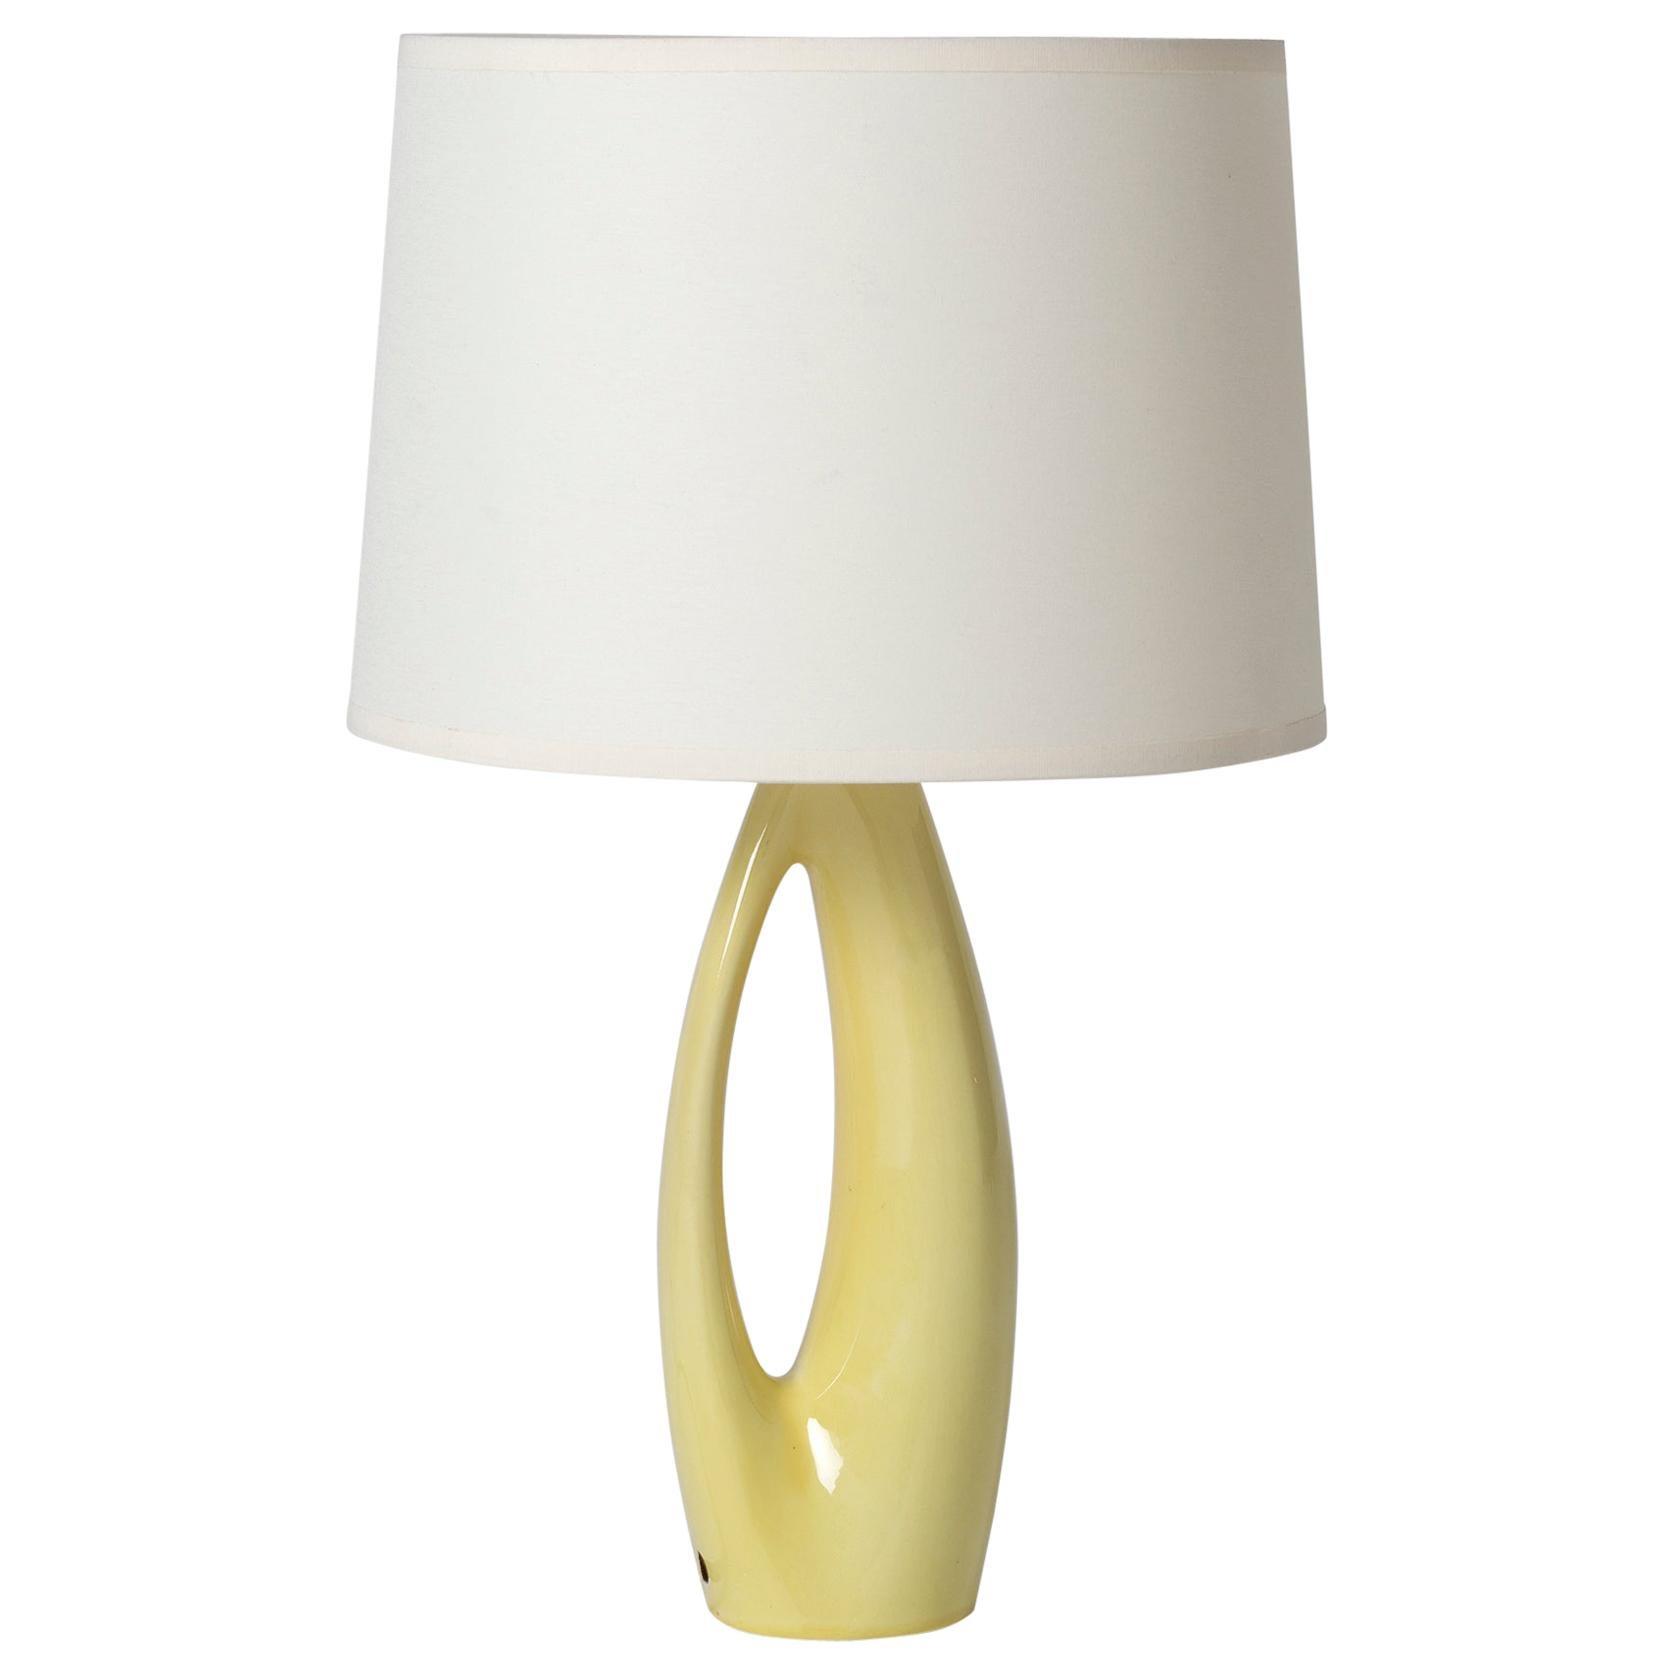 Midcentury Yellow Ceramic Table Lamp by Rörstrand